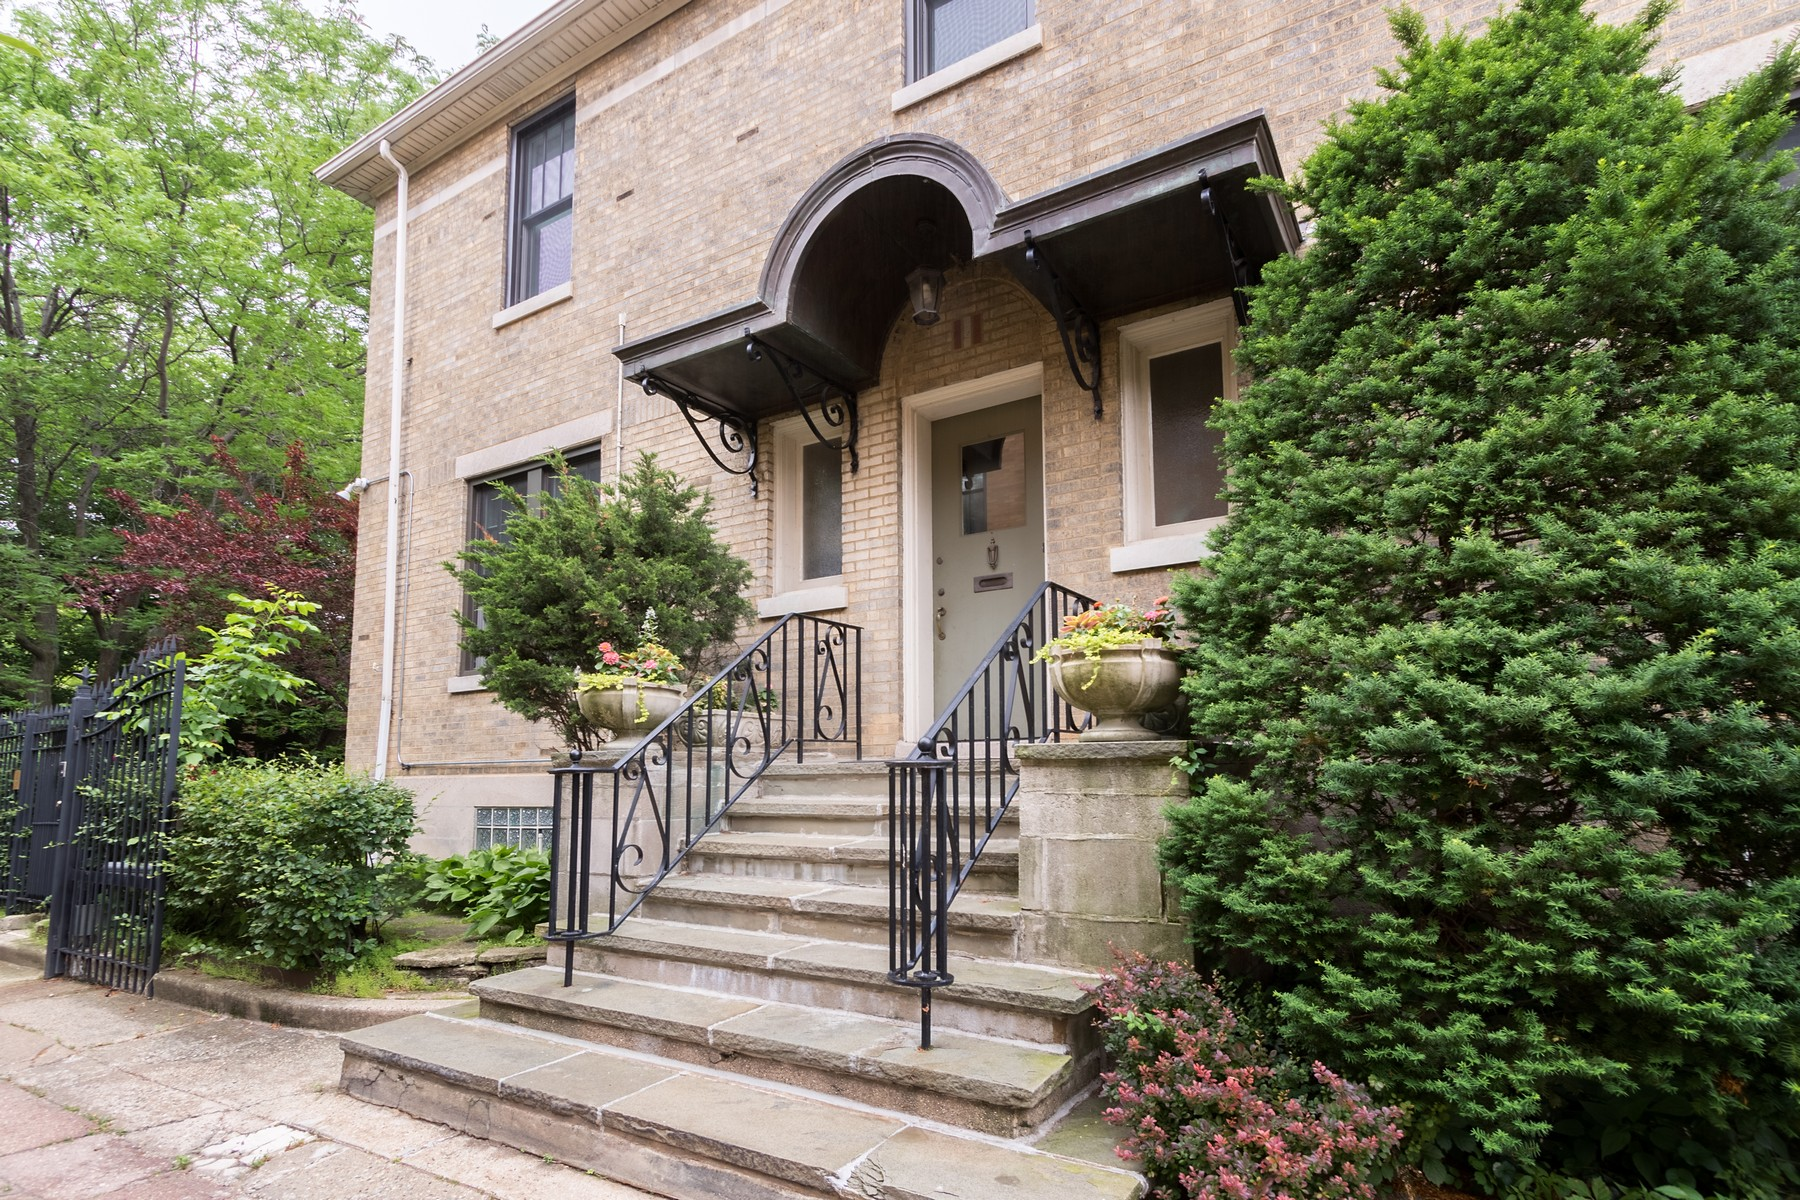 獨棟家庭住宅 為 出售 在 Historic Bright and Beautiful Home 843 W Castlewood Terrace Chicago, 伊利諾斯州, 60640 美國